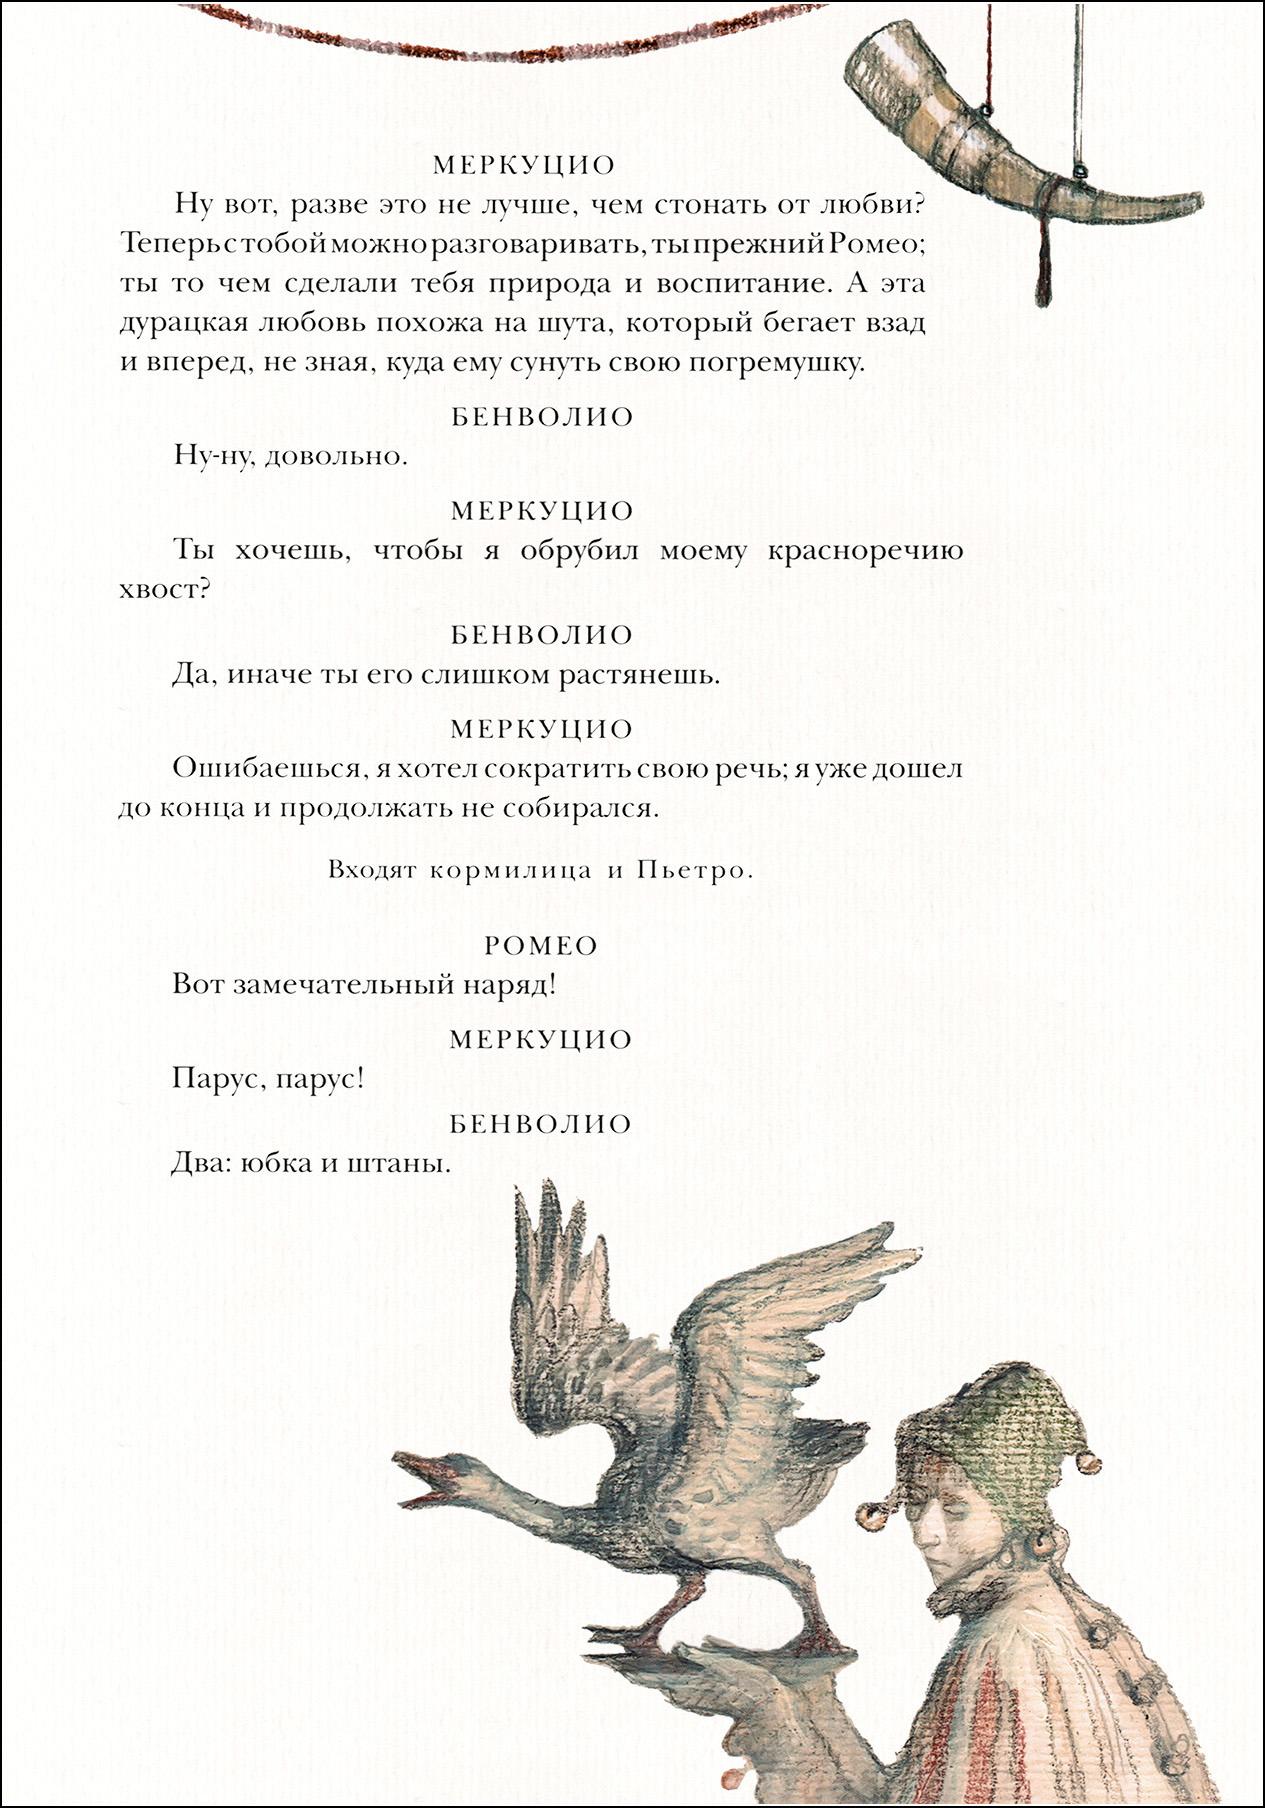 А. Семенова, Ромео и Джульетта